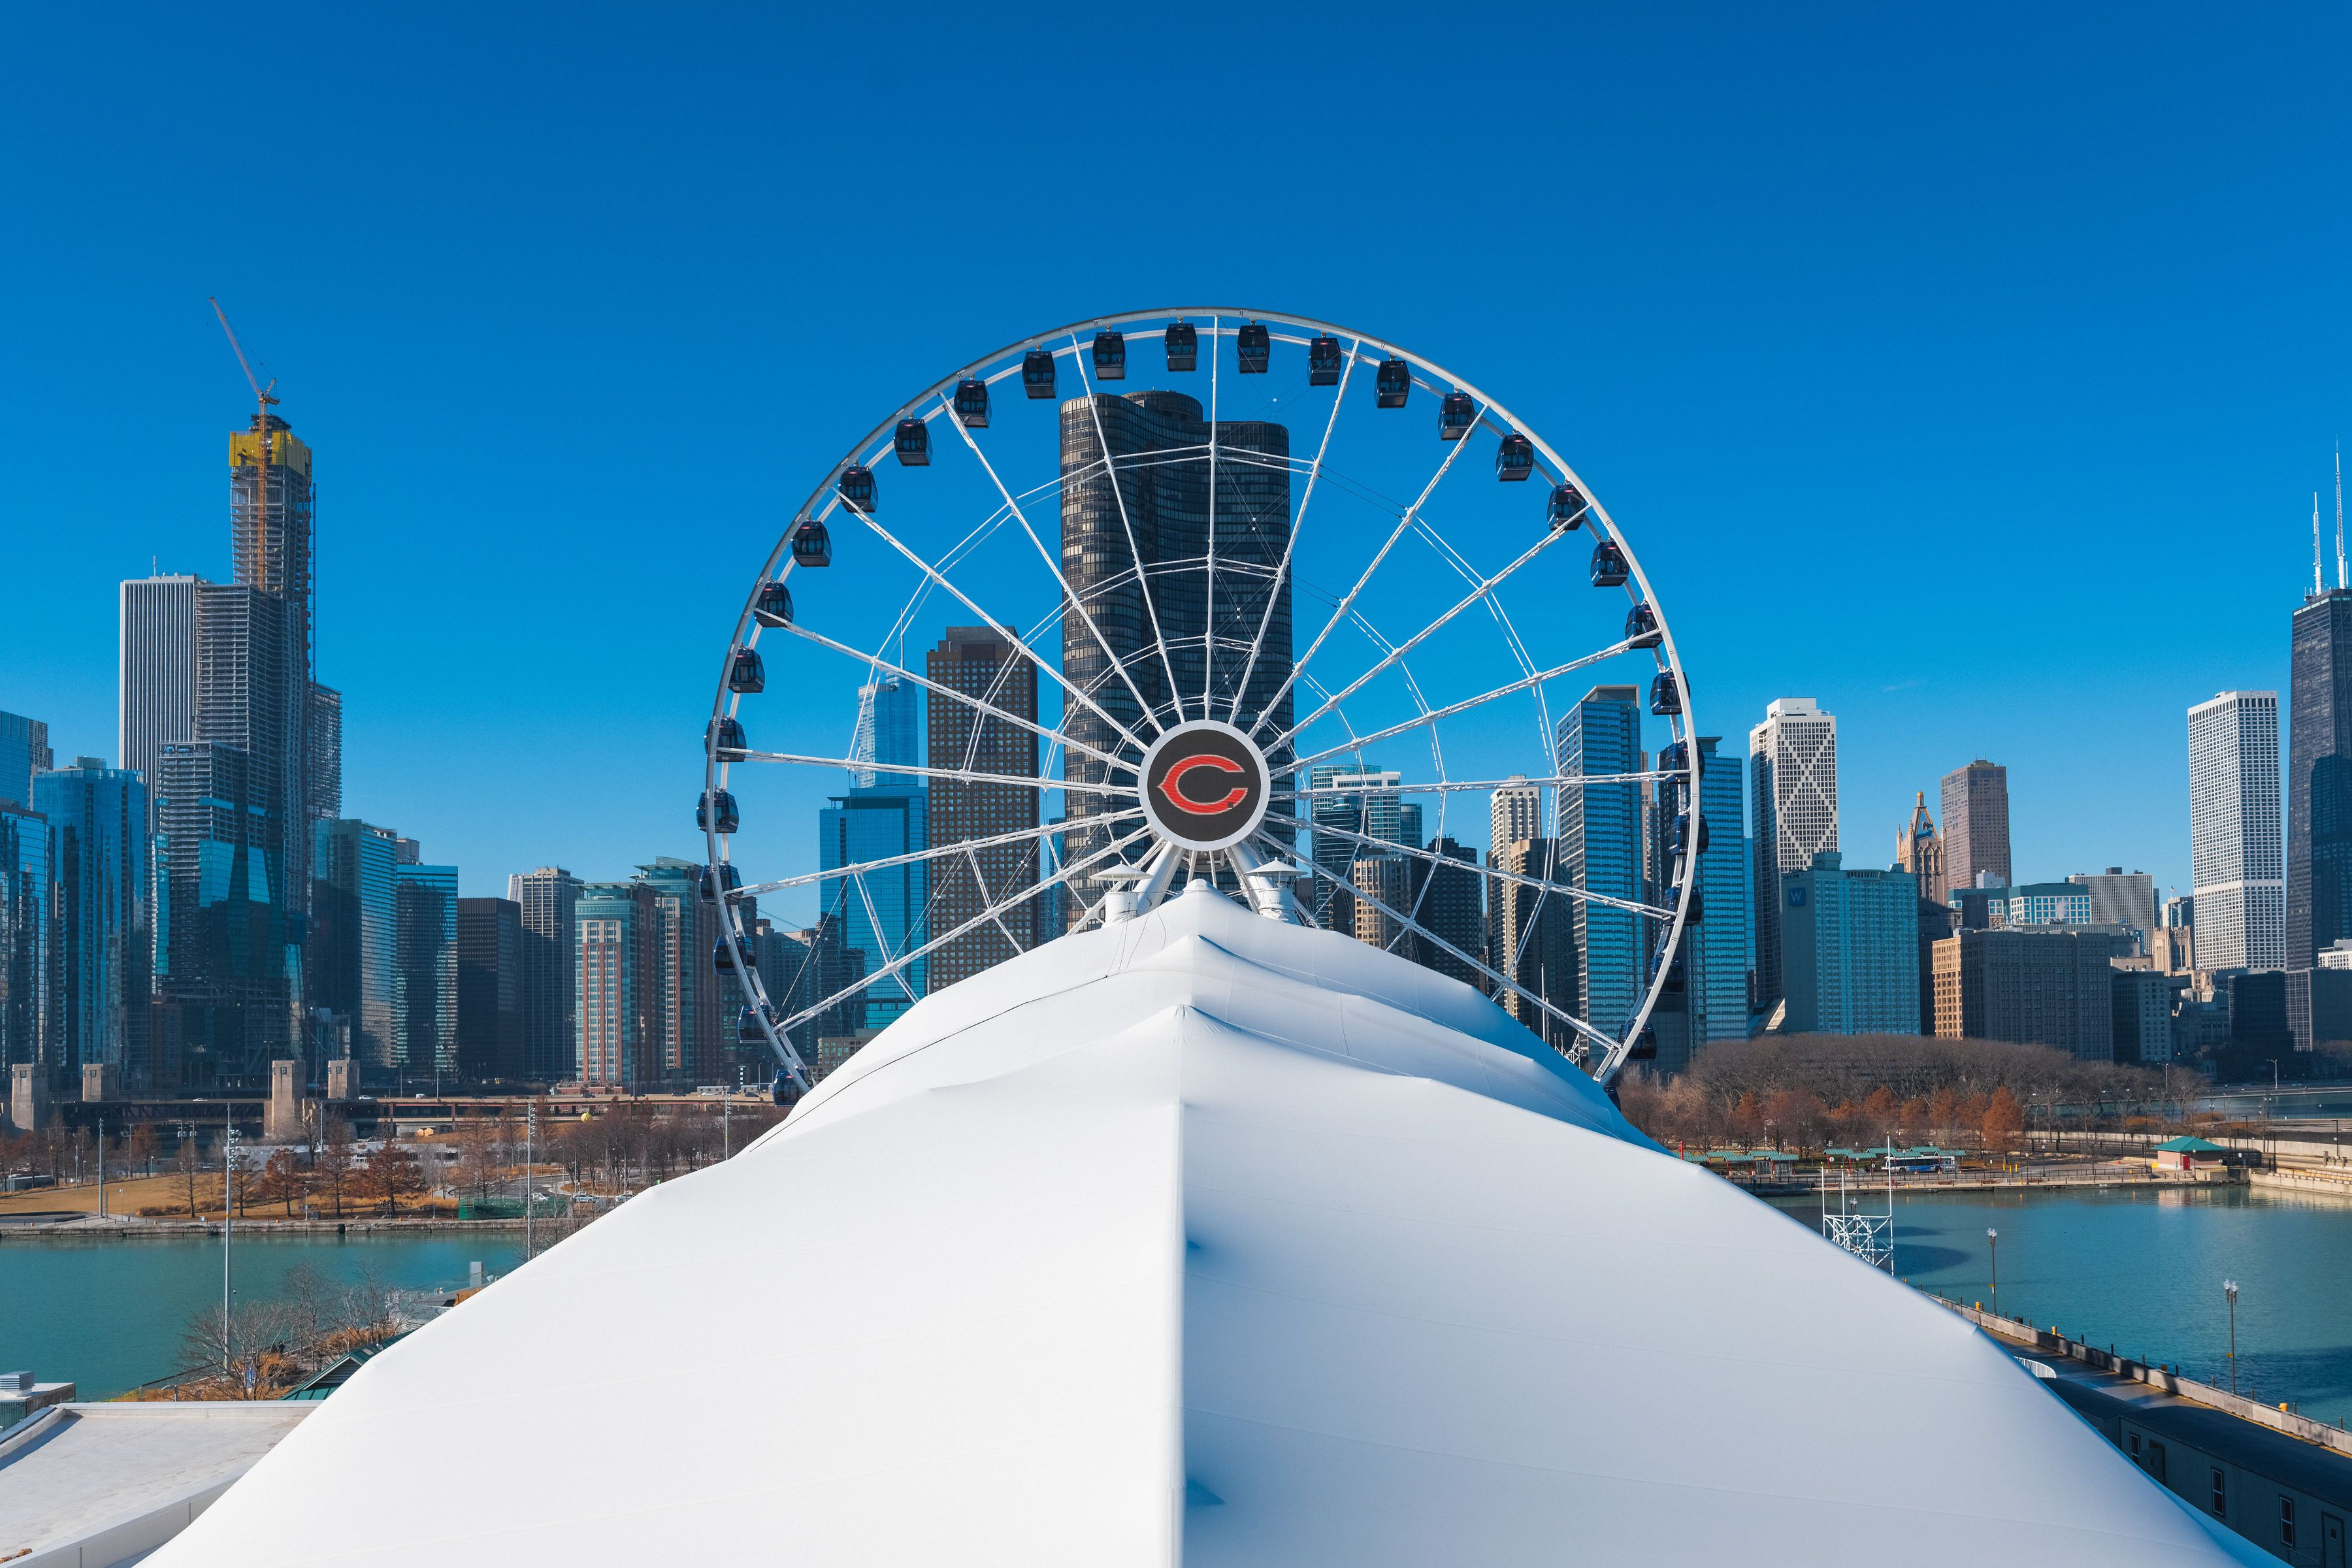 The ferris wheel on Navy Pier